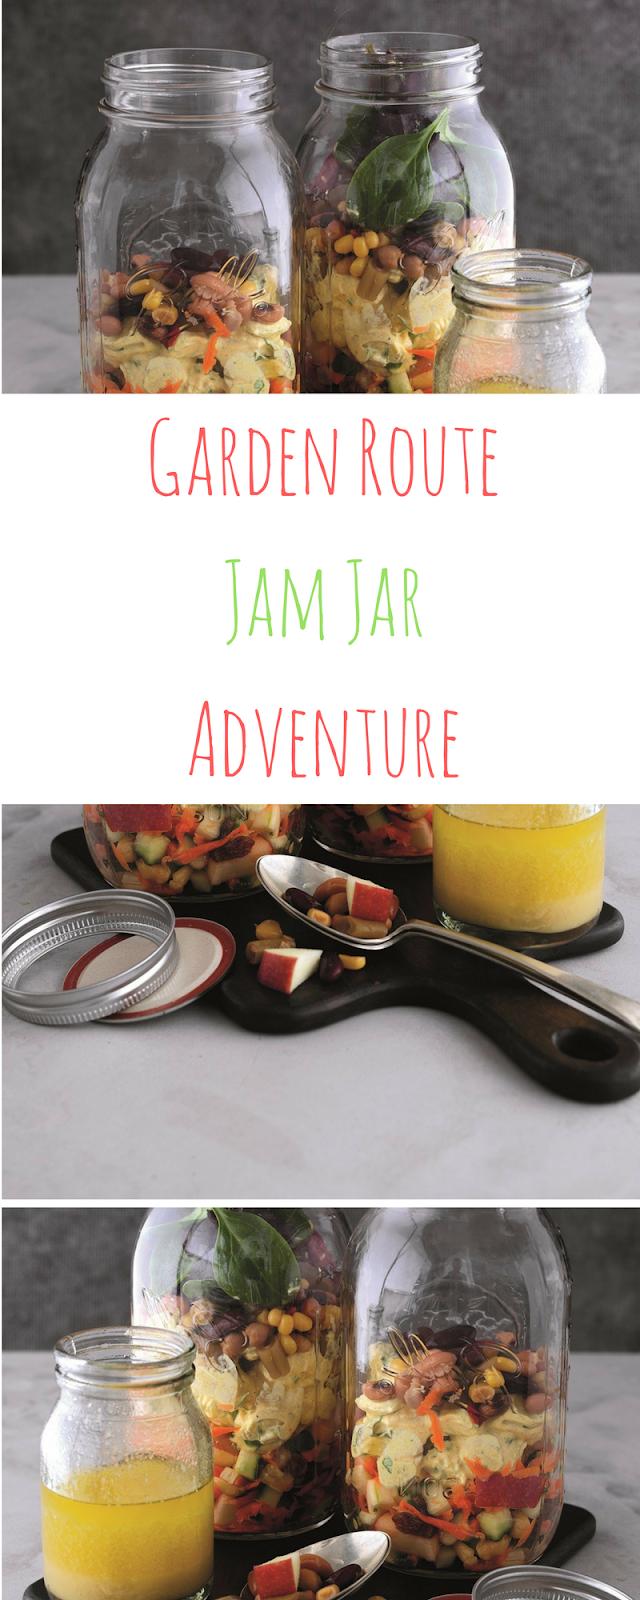 Garden Route Jam Jar Adventure